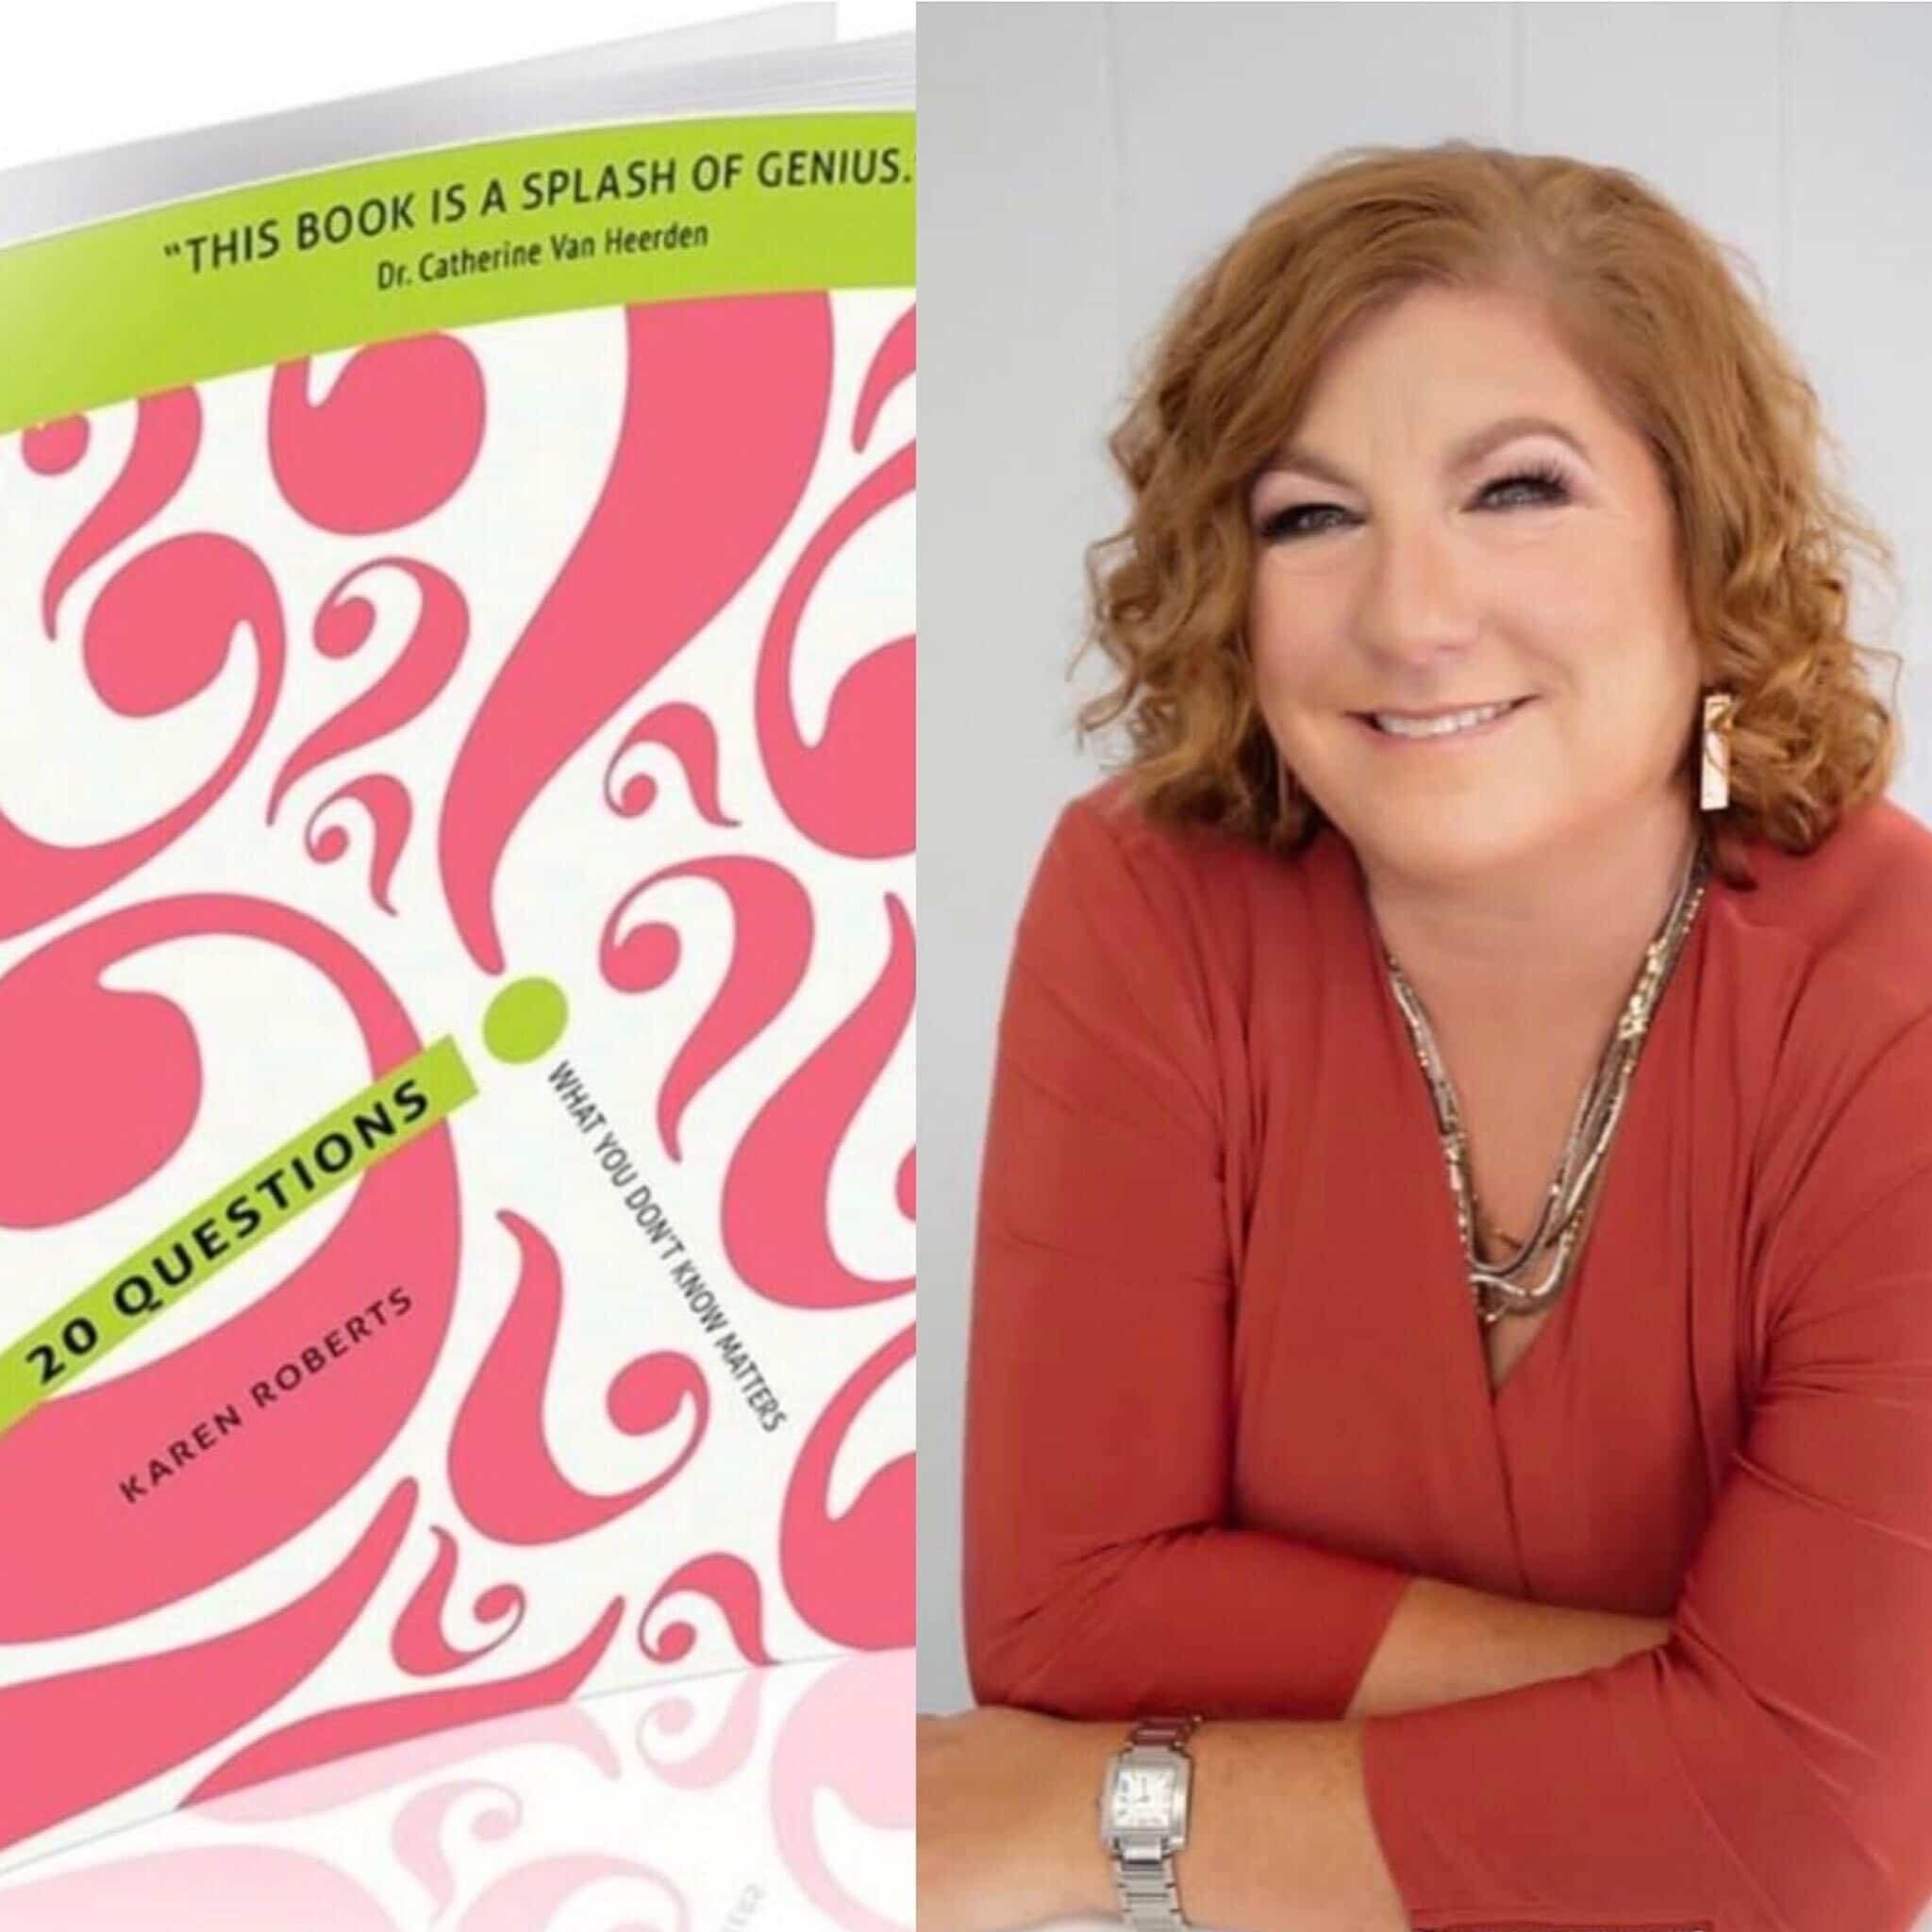 Book Image With Karen